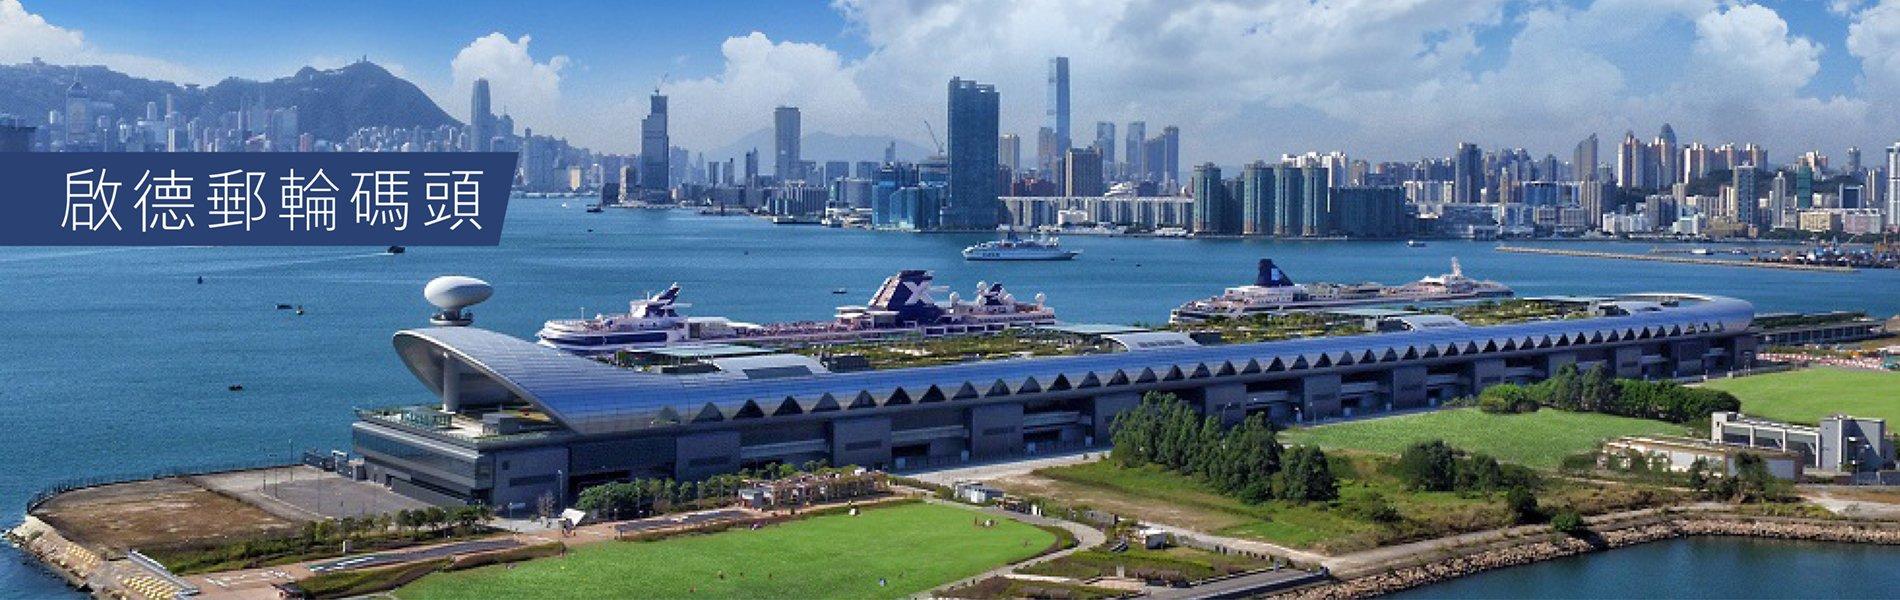 Kai Tak Cruise Terminal Your Gateway To Hong Kong & Asia